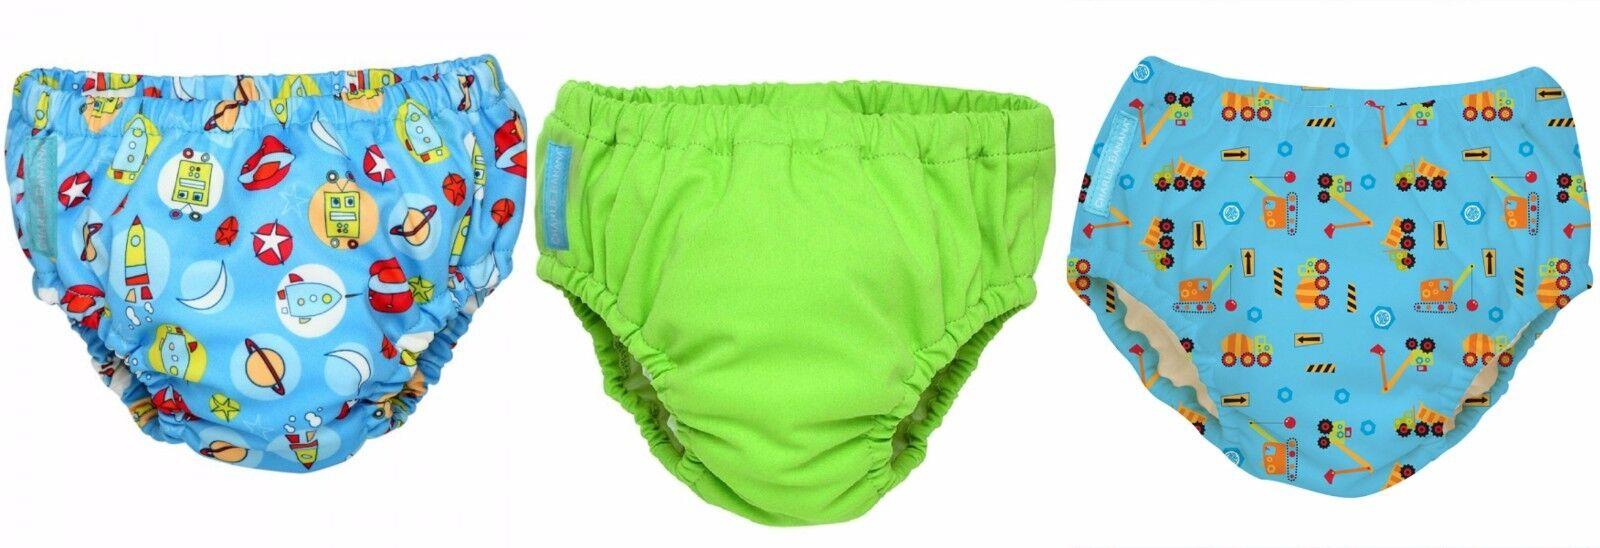 NEW | Charlie Banana Reusable Swim Diaper - Small - Choose C